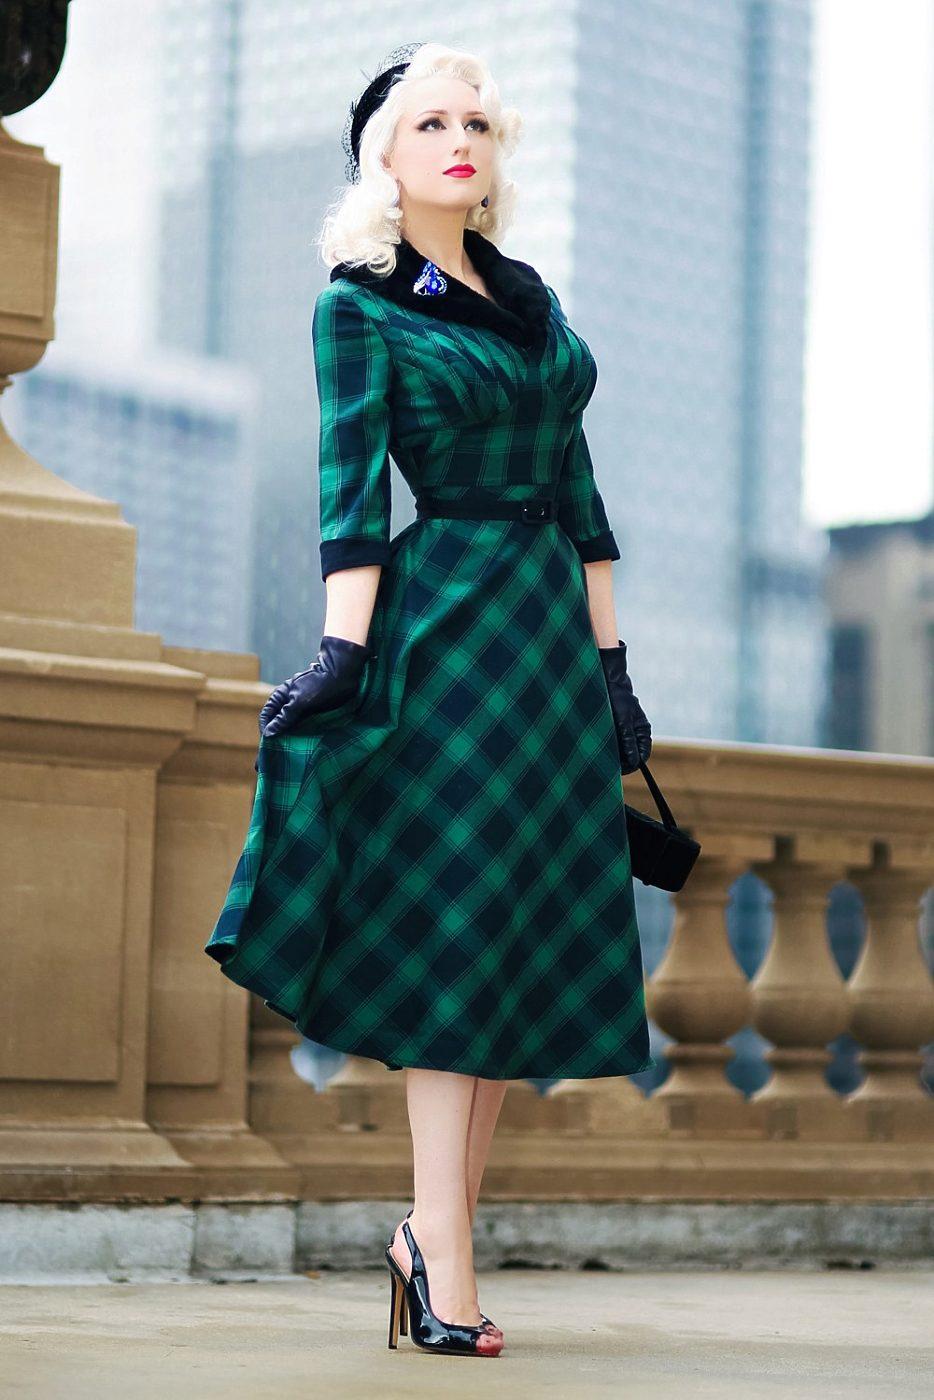 e2dc877d46e3 Tartanové šaty s kožešinovým límcem Voodoo Vixen Lola Voodoo Vixen ...